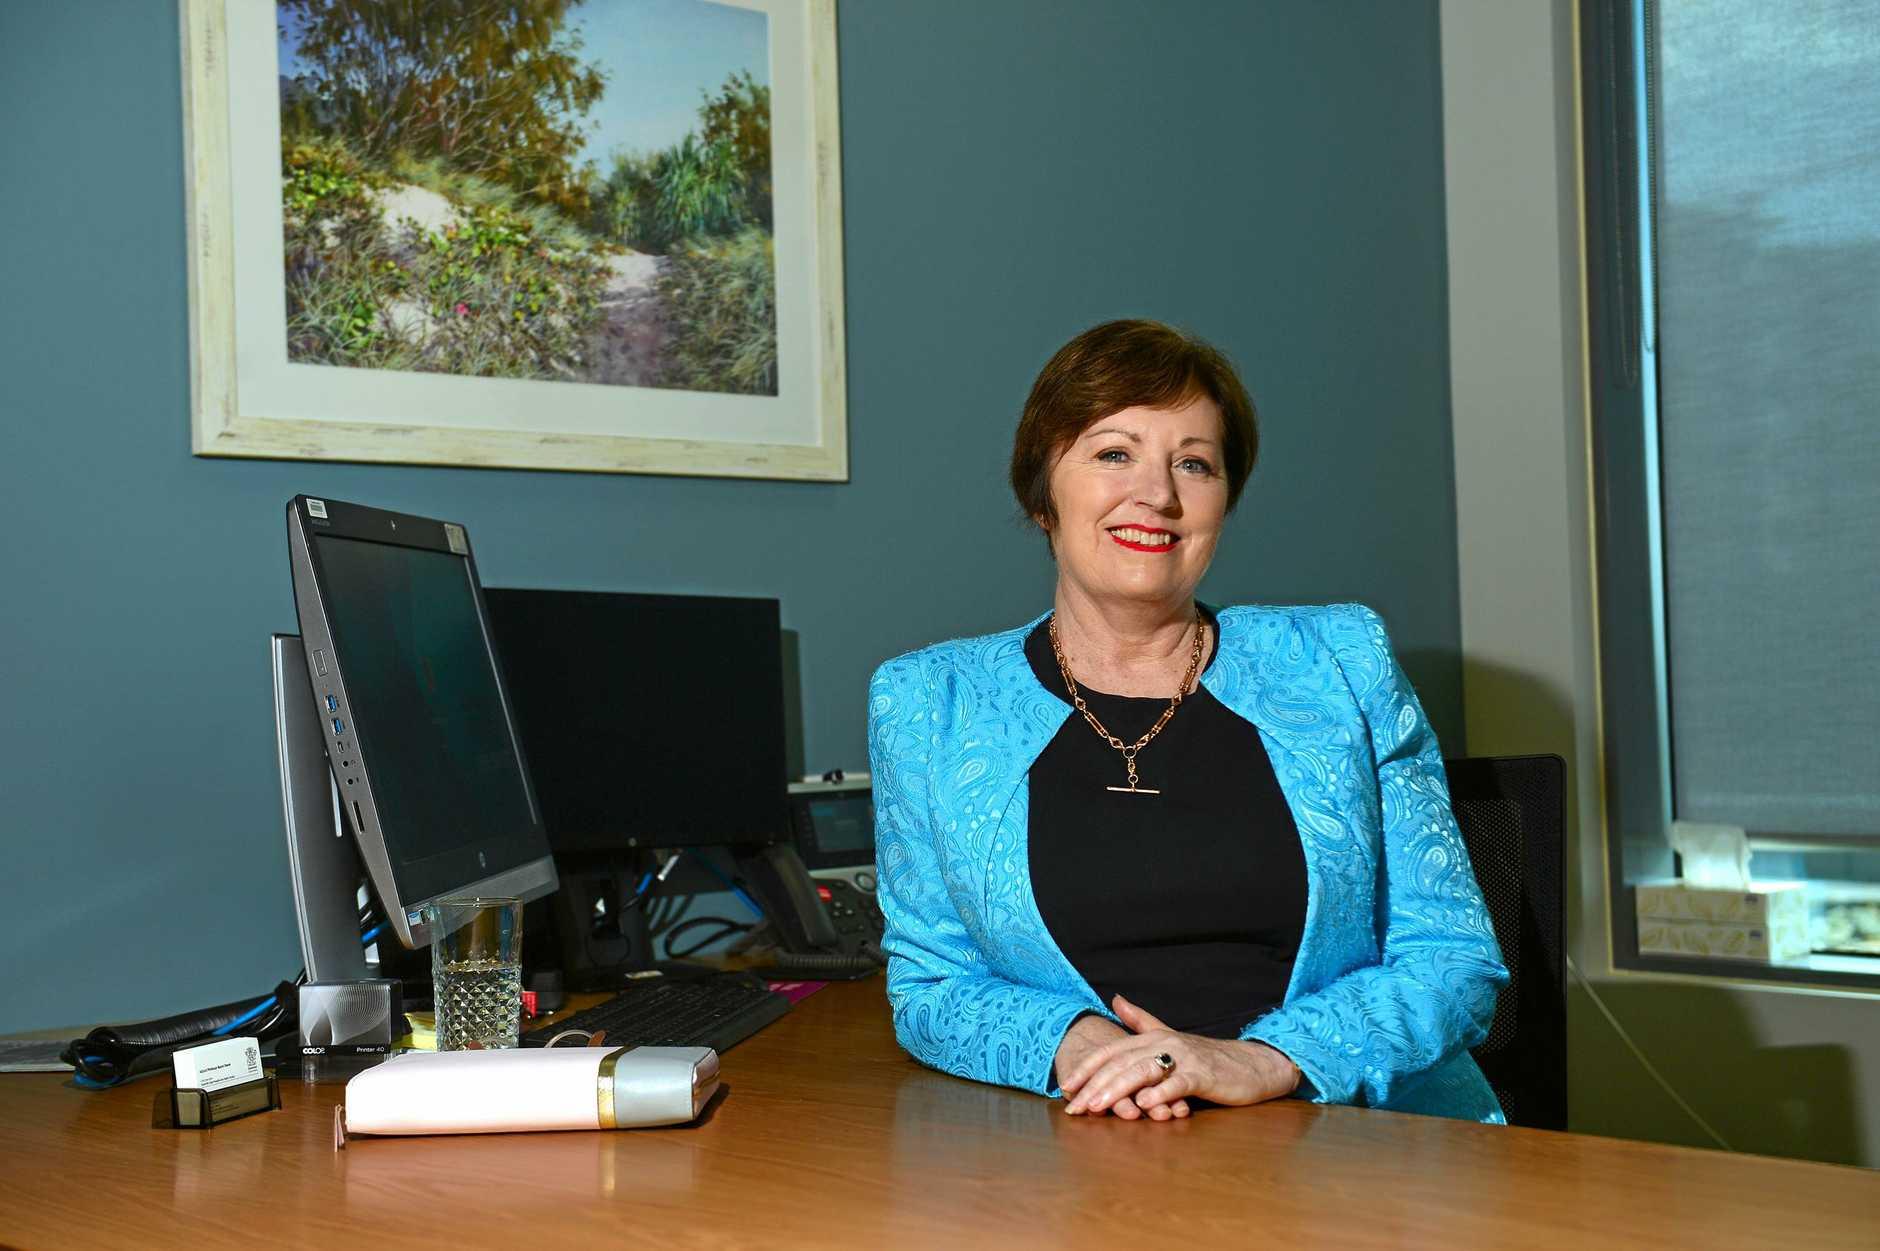 Sunshine Coast Health Service chief executive, Adjunct Professor Naomi Dwyer at the Sunshine Coast University Hospital.